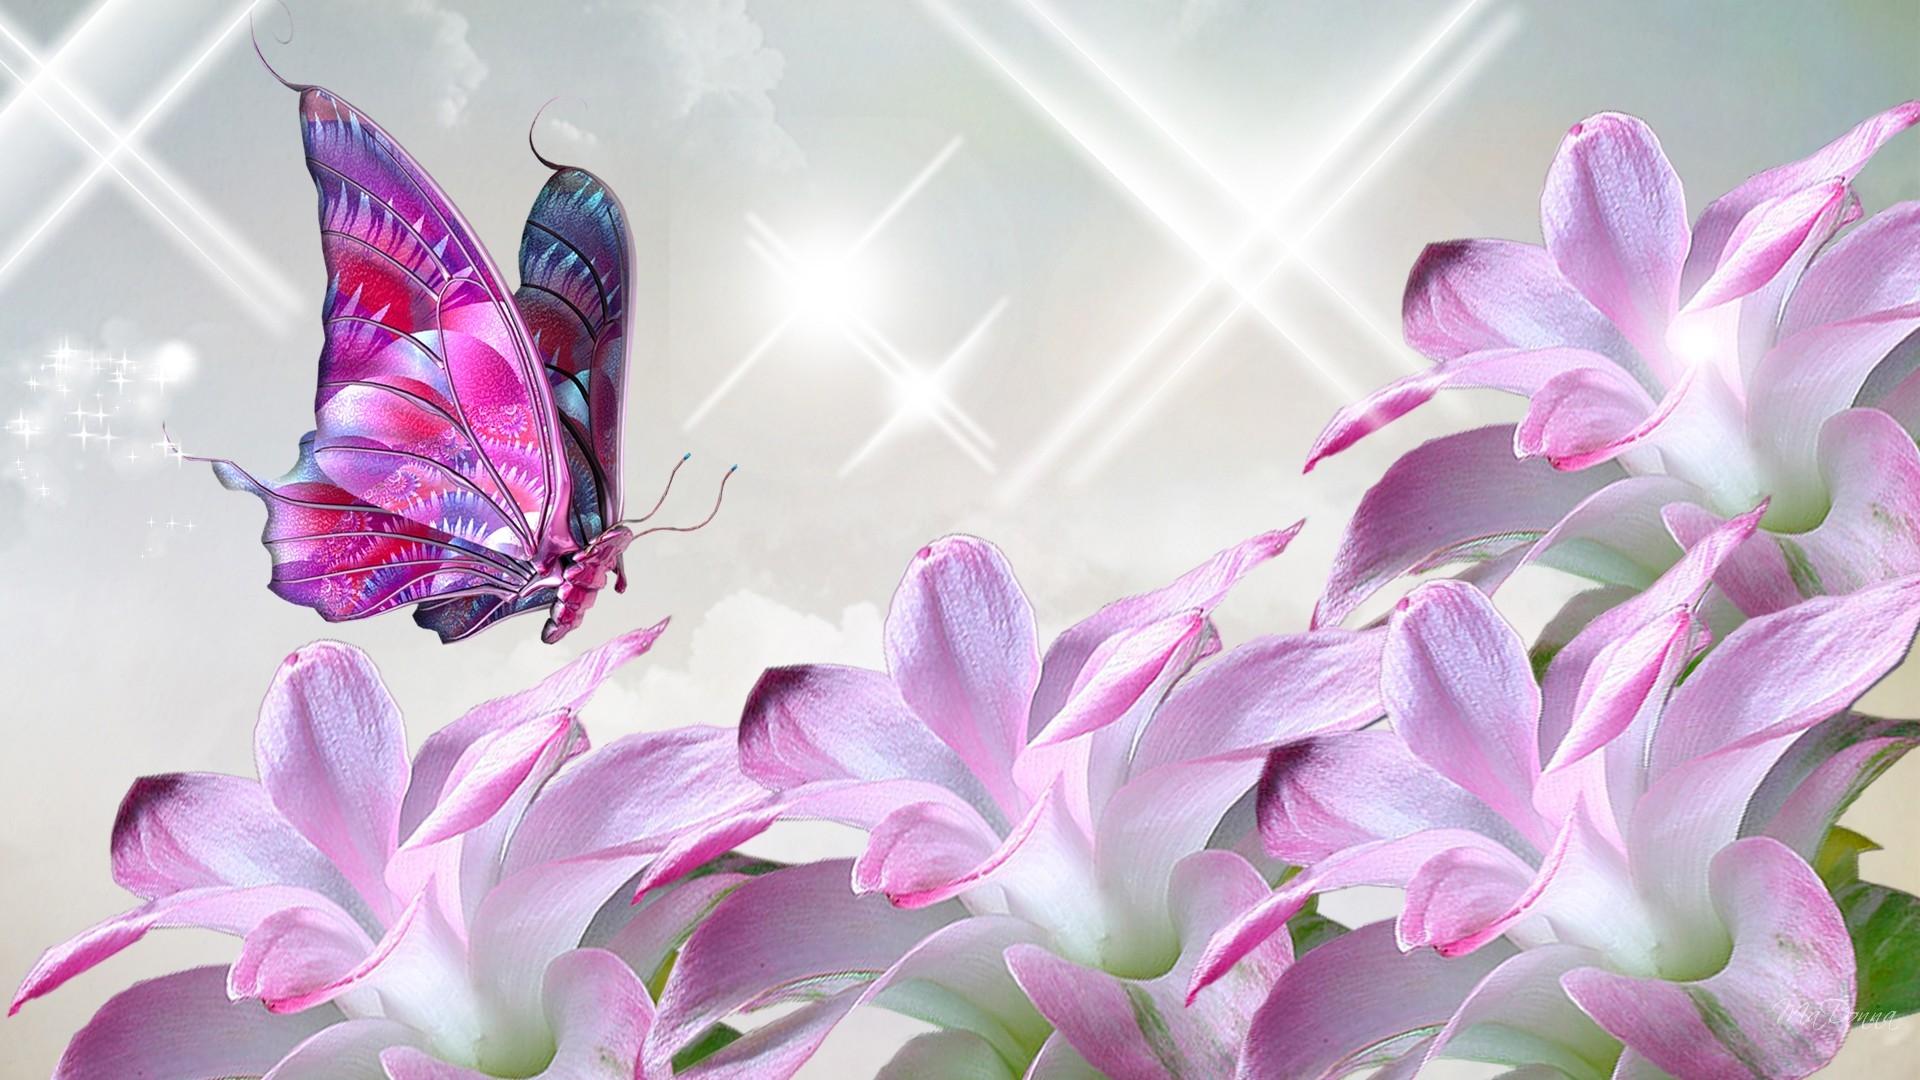 flowers devine wallpaper - photo #2